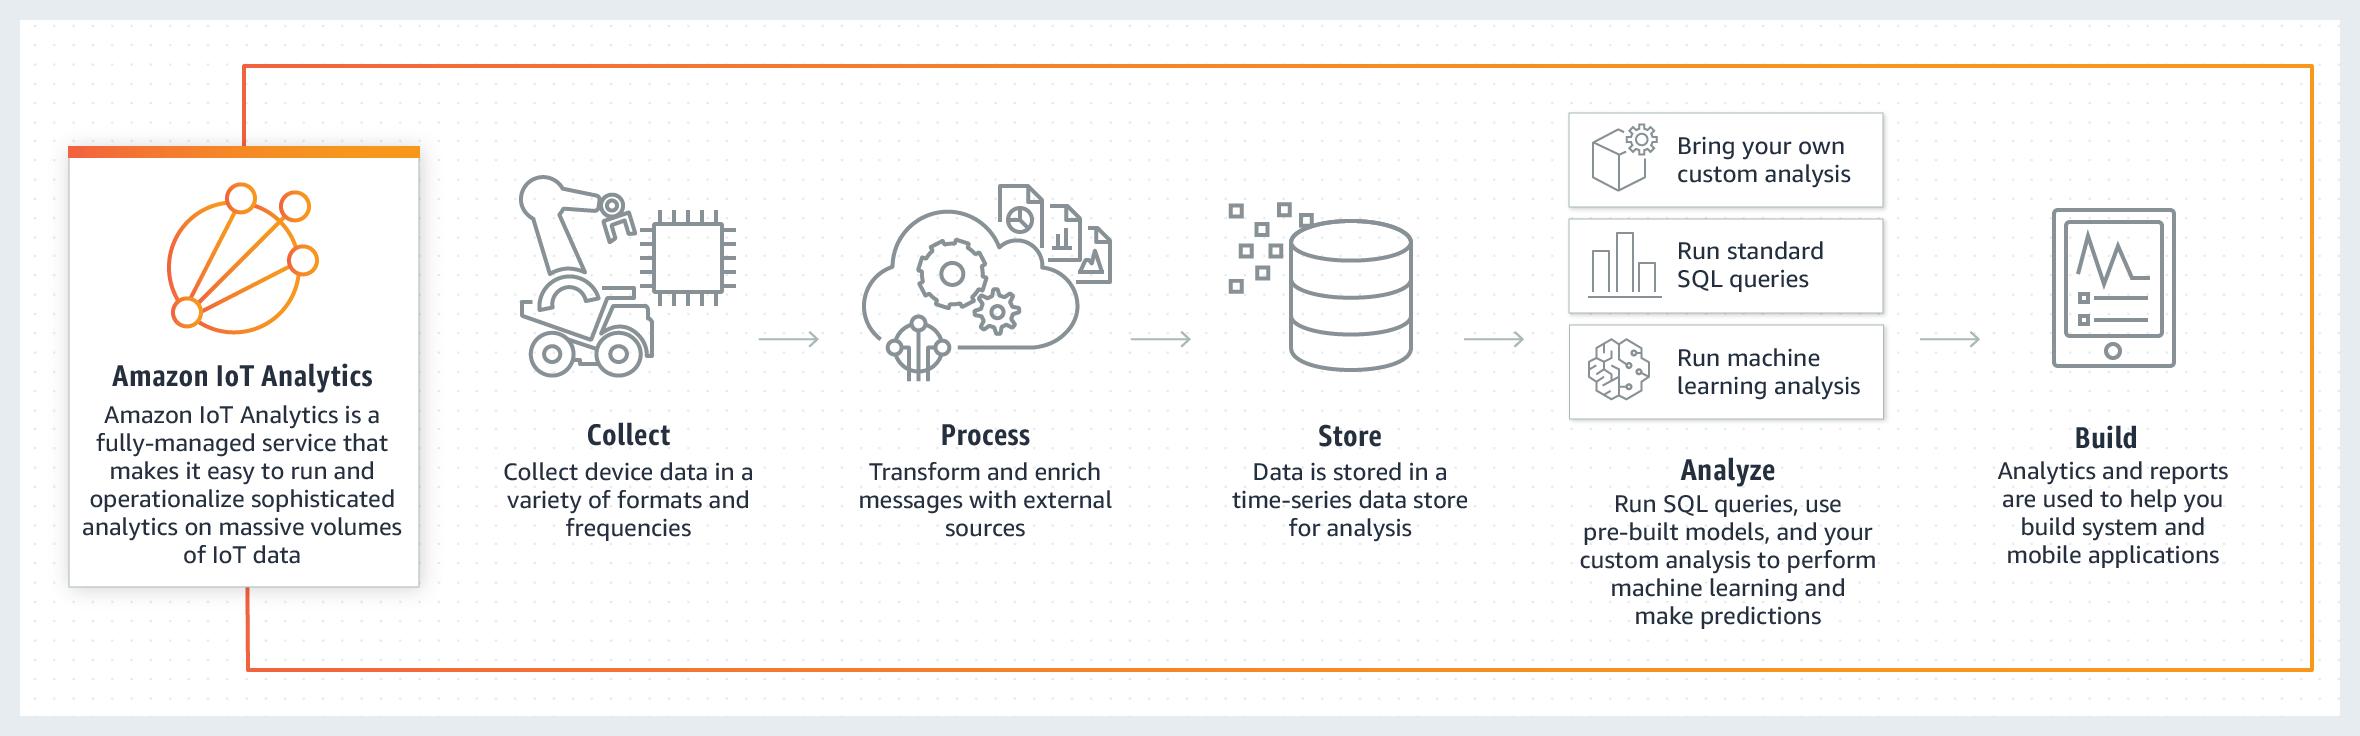 Amazon loT Analytics 的工作原理